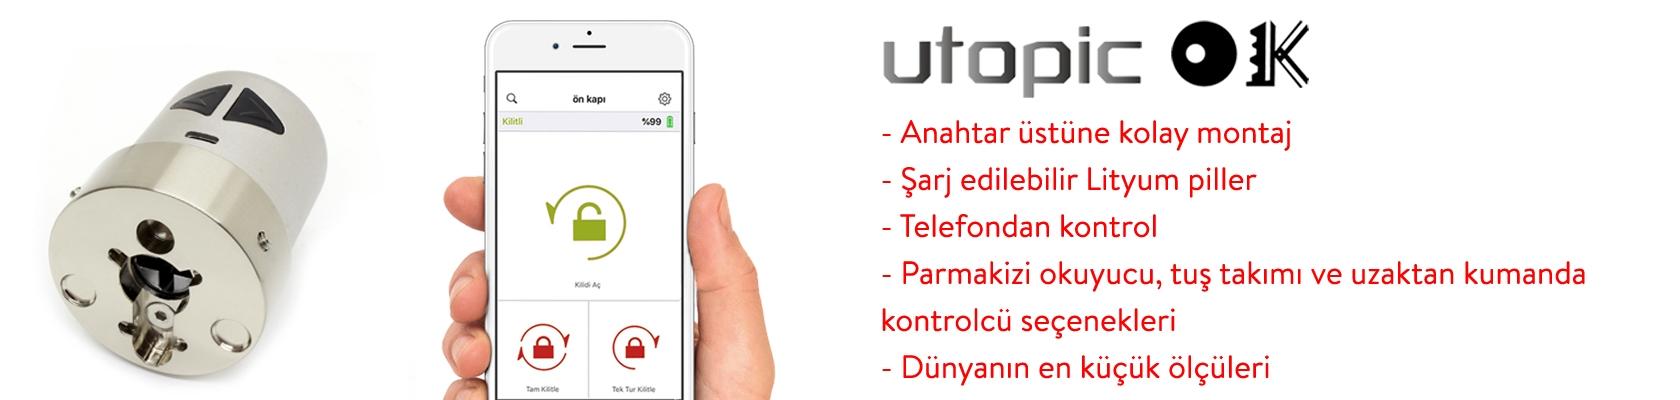 Desi Utopic Ok Tip A Akıllı Kilit